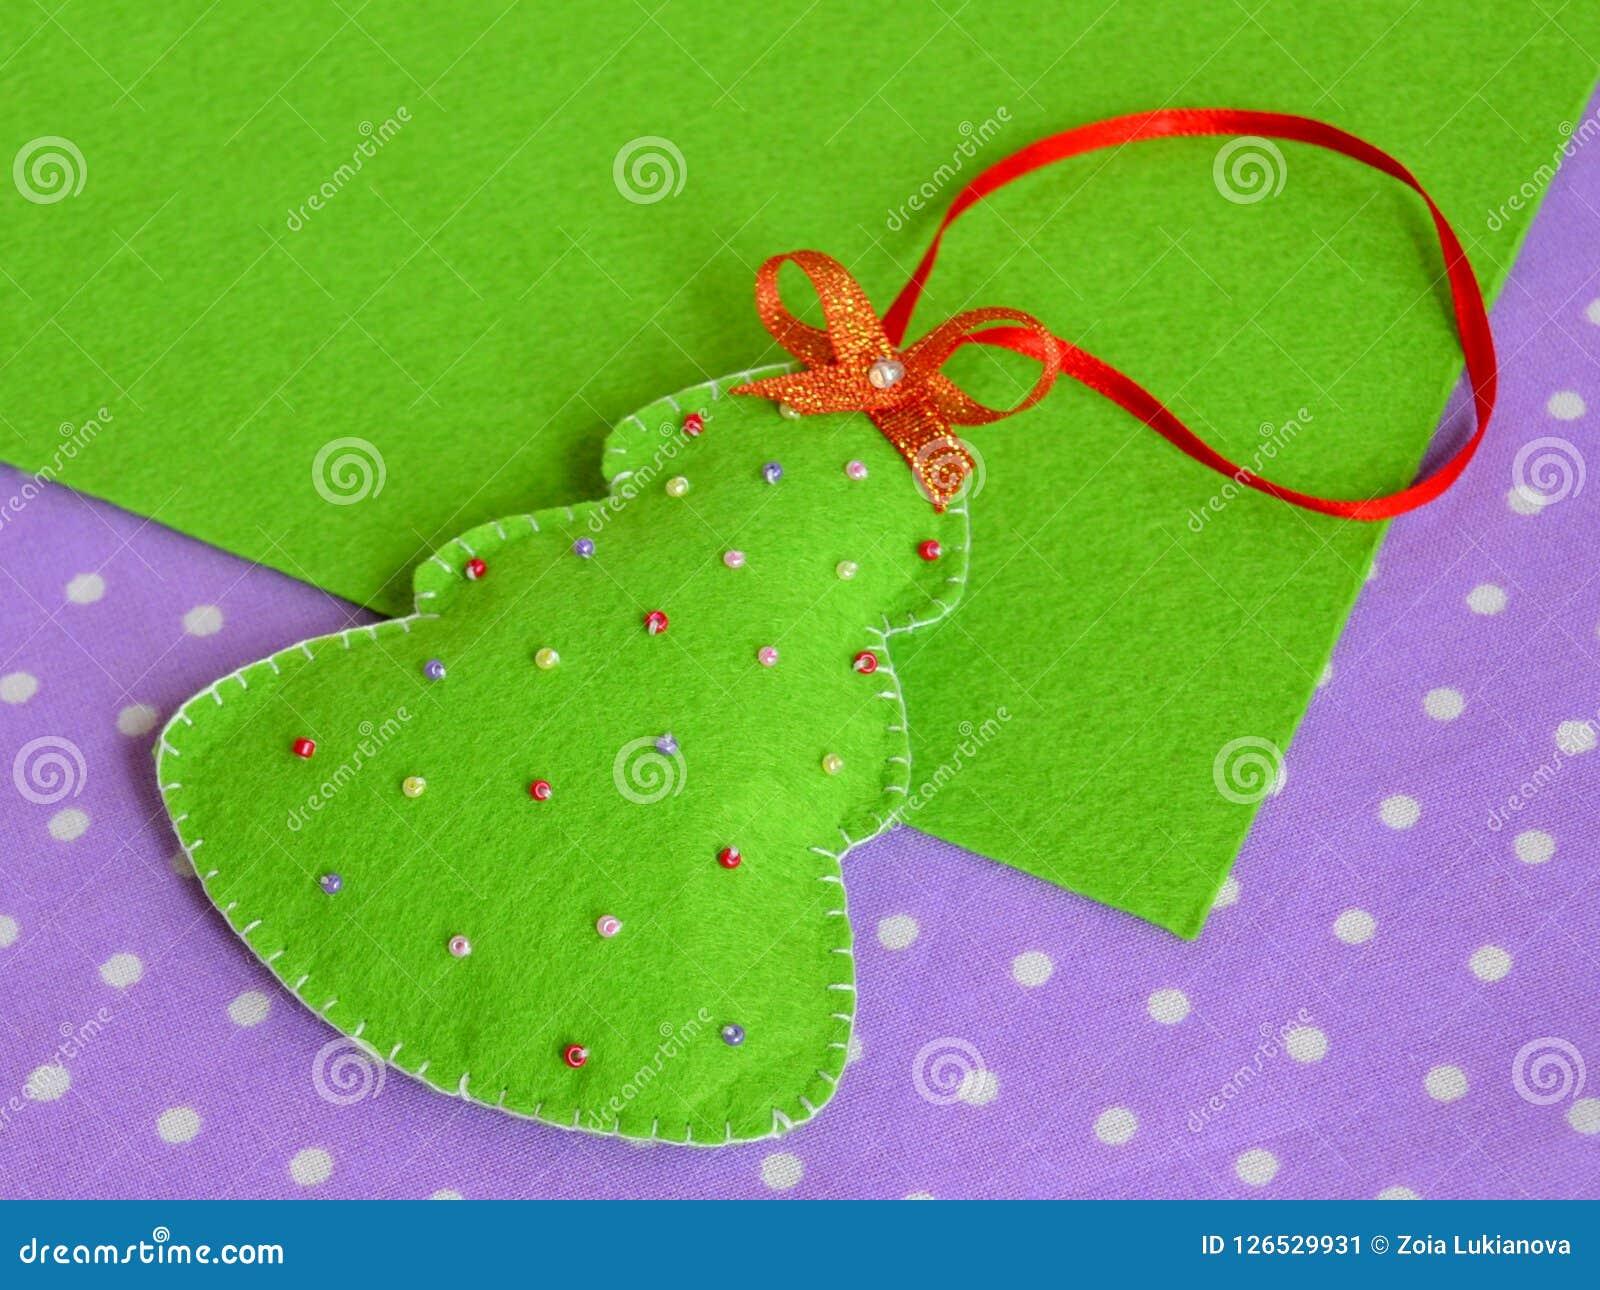 Simple Christmas Crafts.Handmade Christmas Tree Of Felt Kids Craft Stock Image